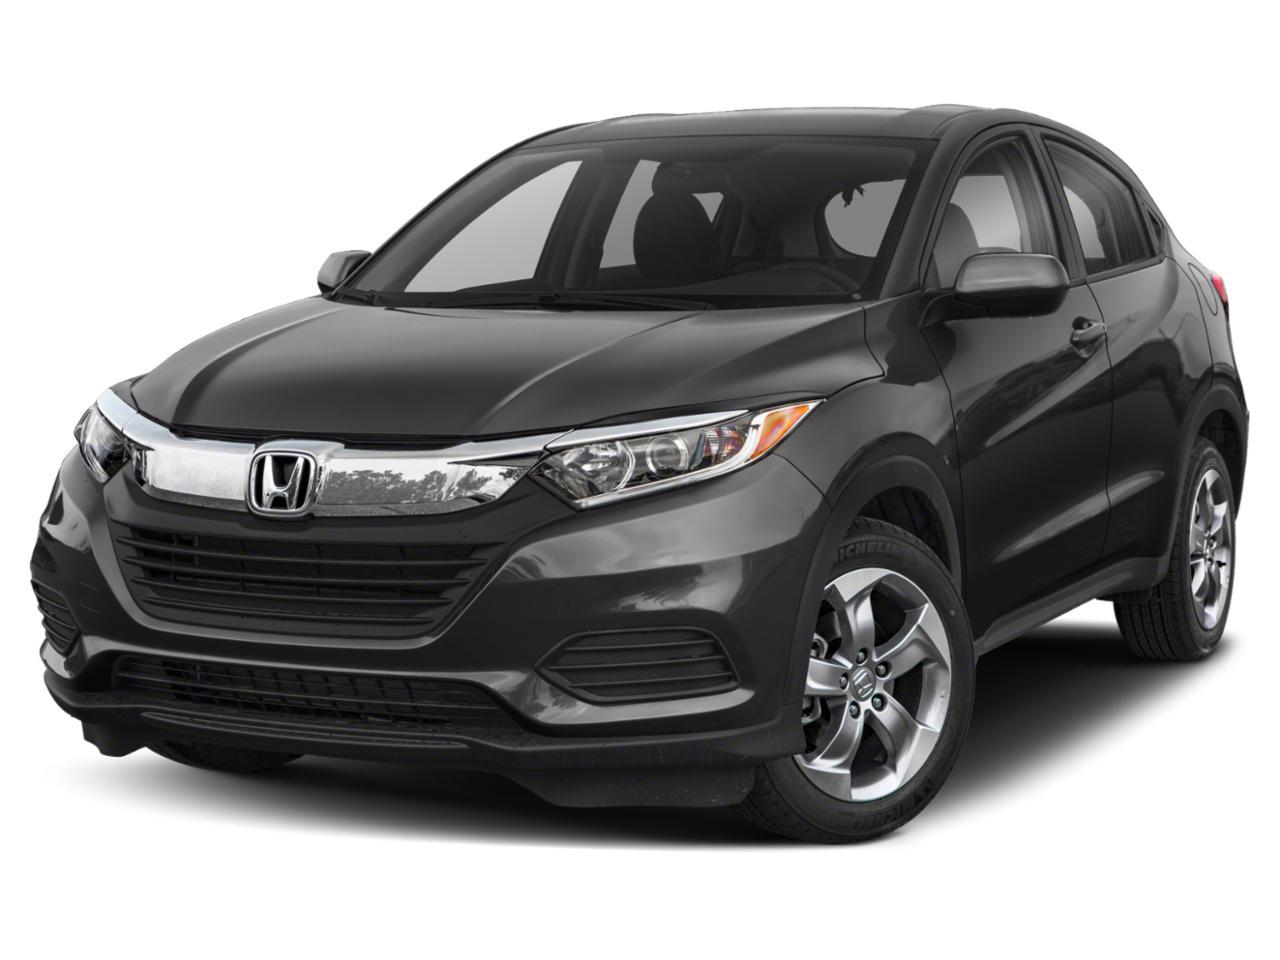 2021 Honda HR-V Vehicle Photo in San Antonio, TX 78238